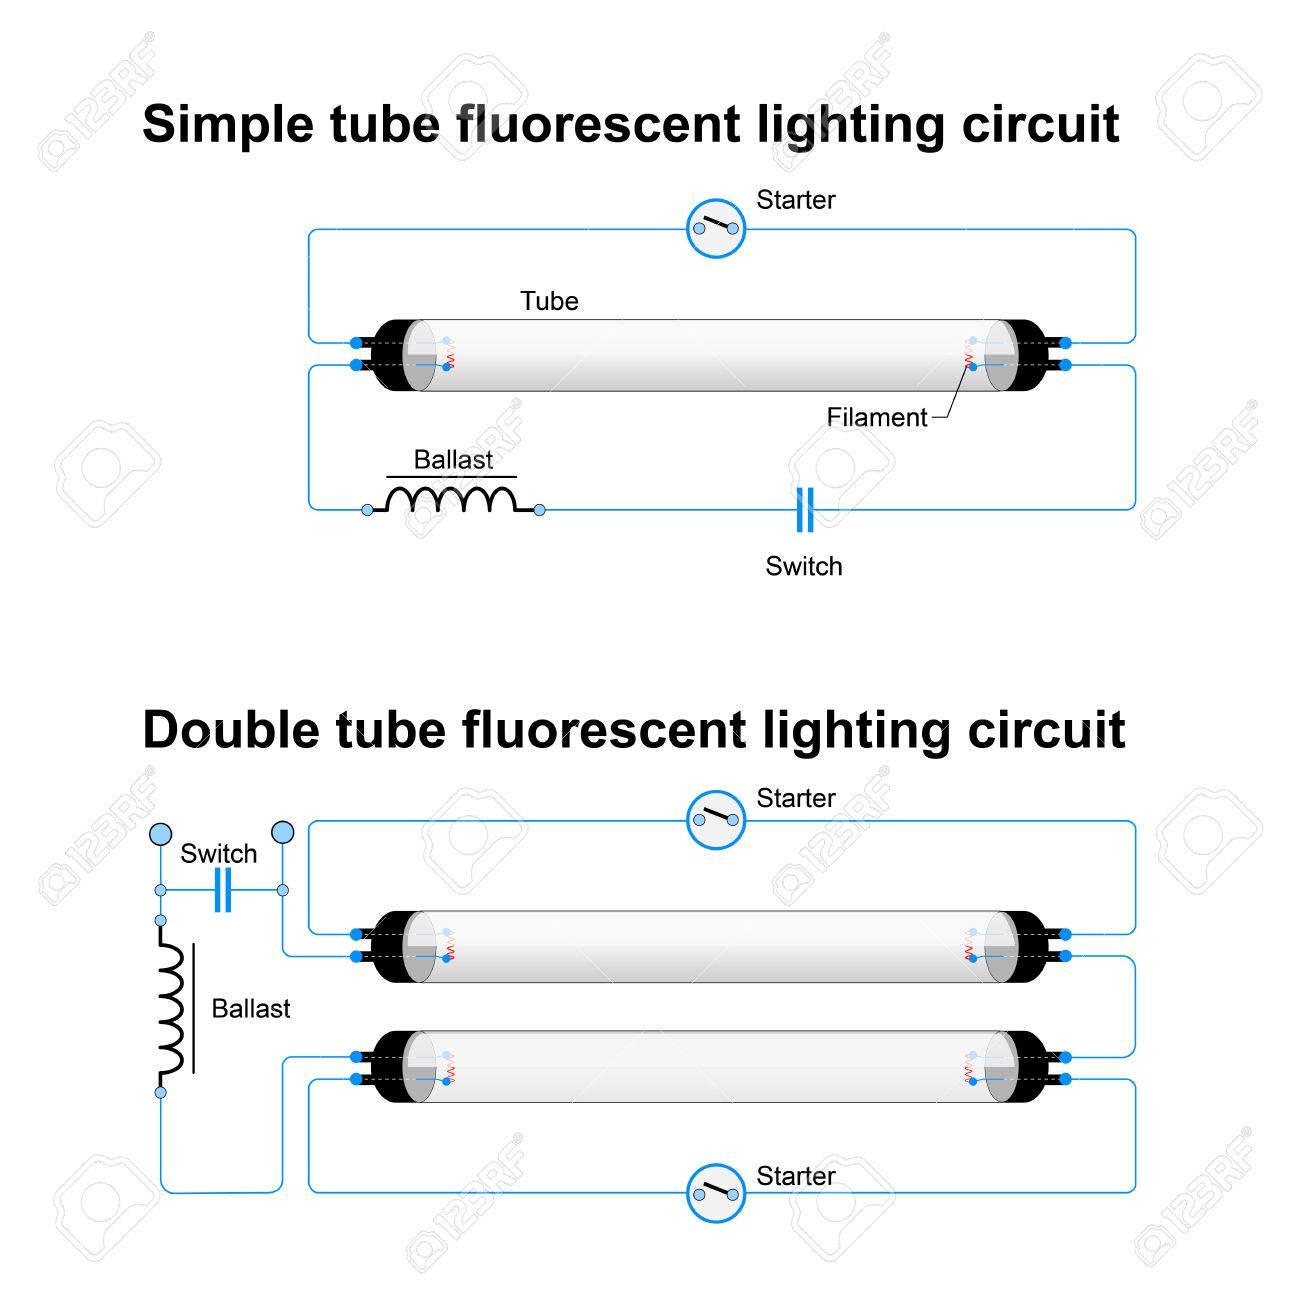 wiring fluorescent lights in parallel diagram wire center u2022 rh caribcar co Fluorescent Table Lamp Wiring Diagram T12 Ballast Wiring Diagram